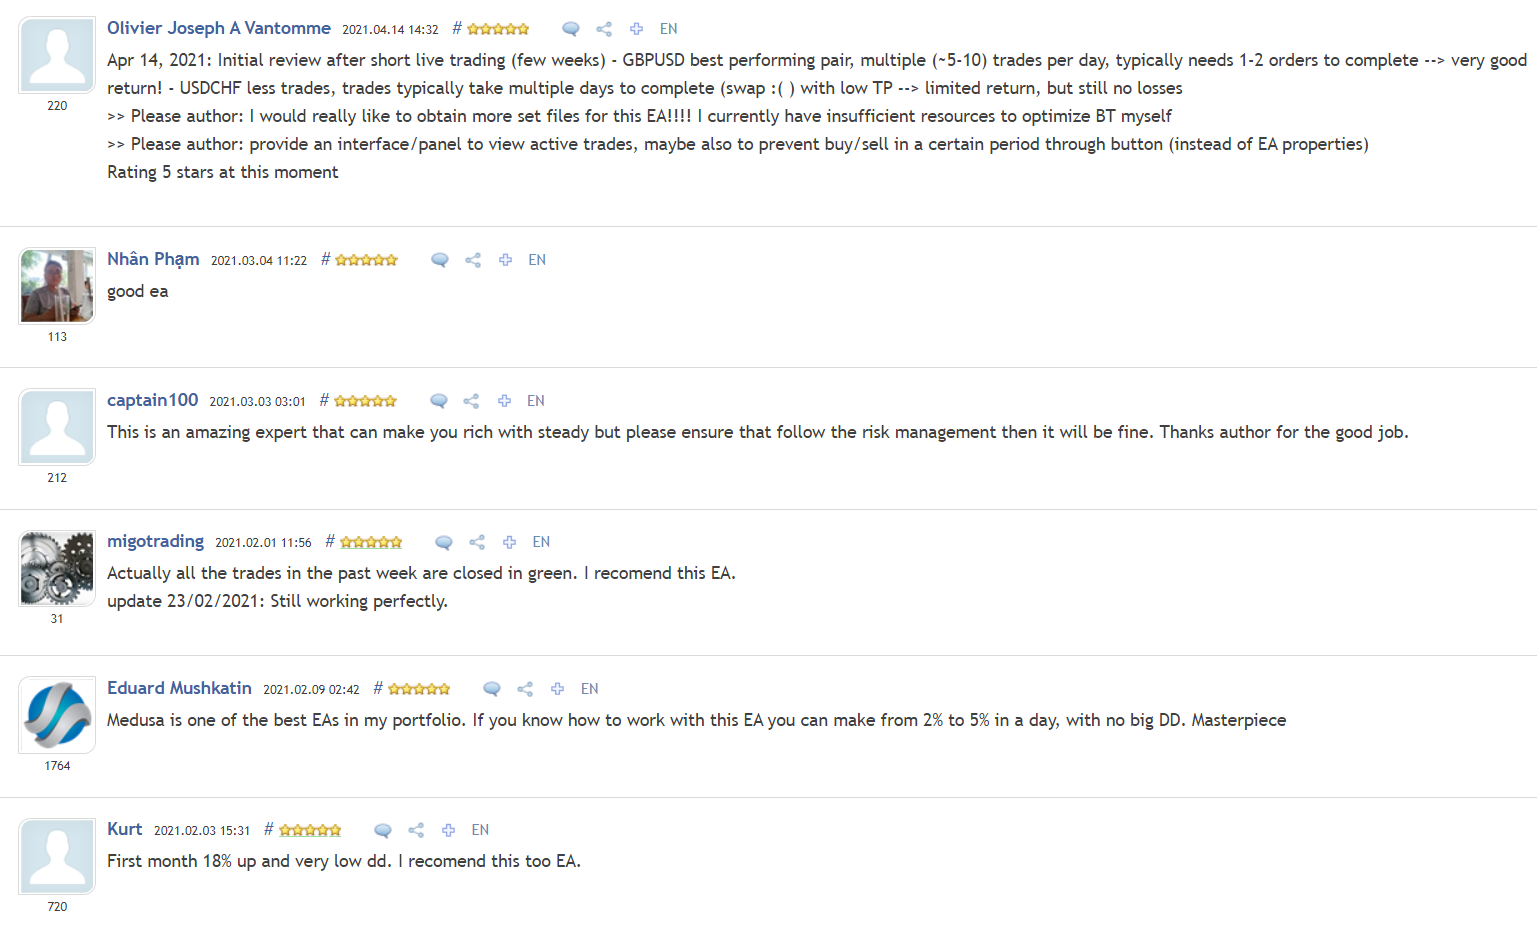 Medusa X Customer Reviews